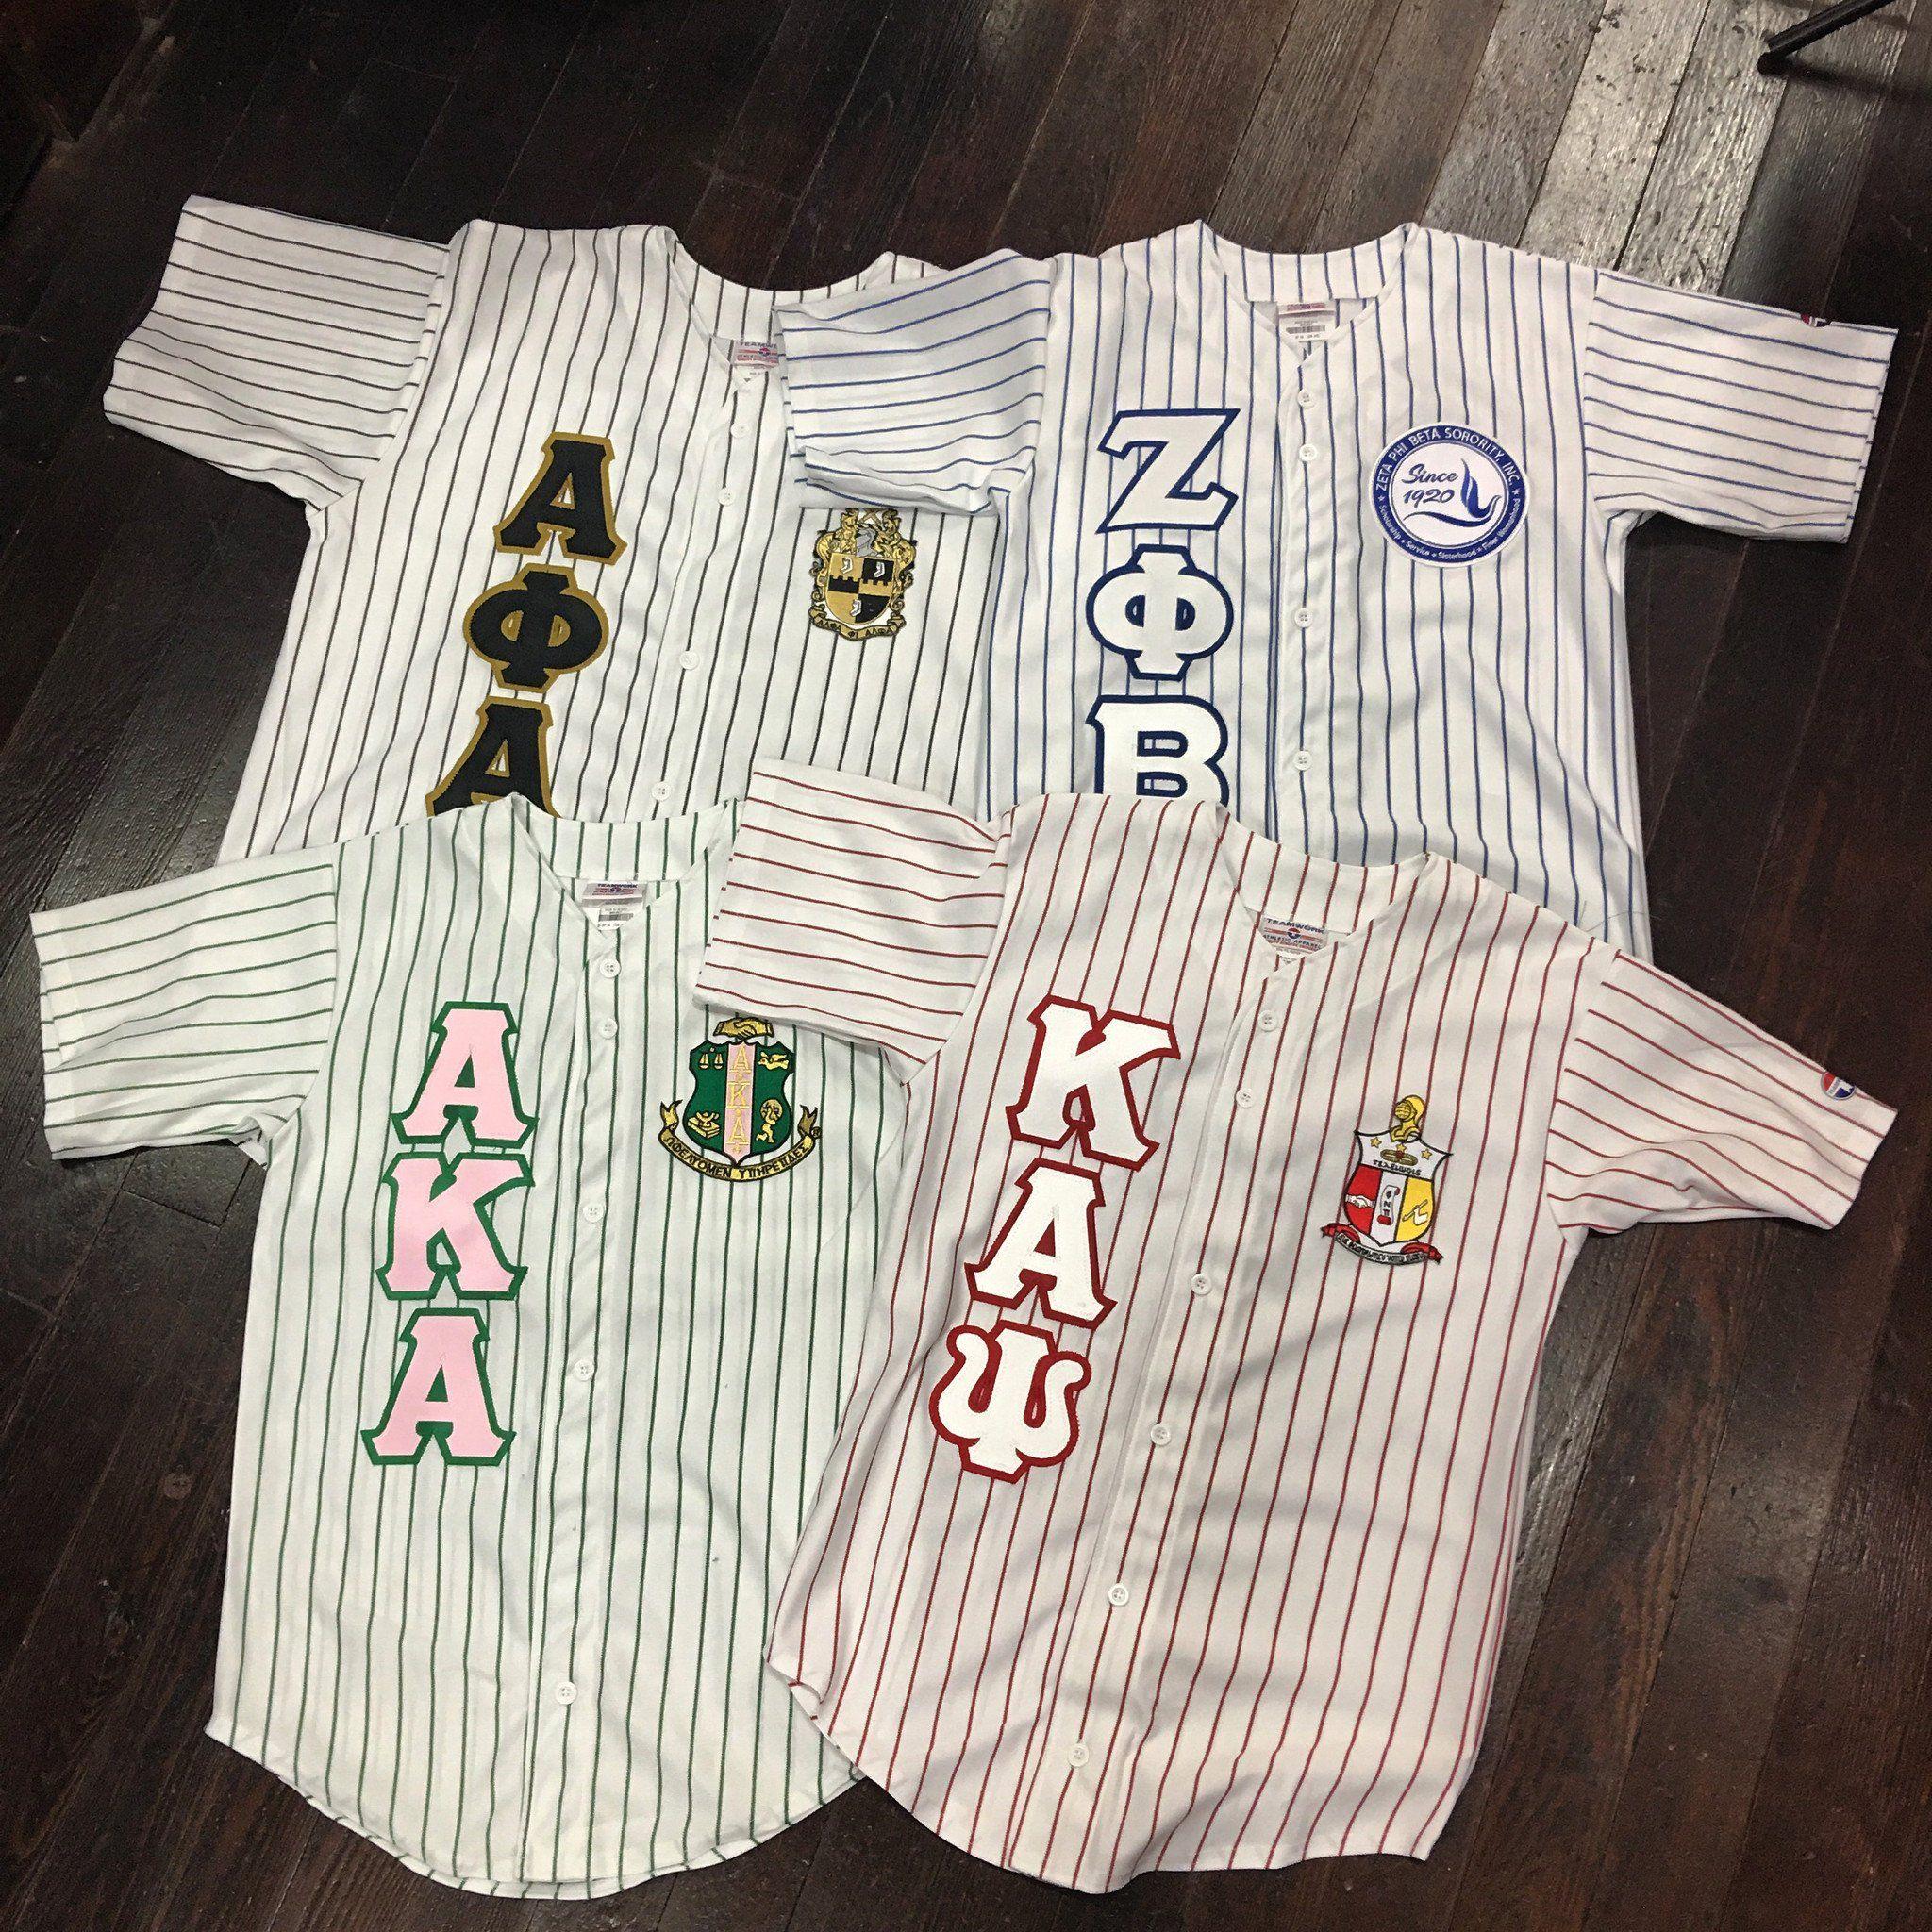 Sewn Letter Pinstripe Baseball Jersey In 2020 Sorority And Fraternity Alpha Phi Alpha Paraphernalia Alpha Fraternity